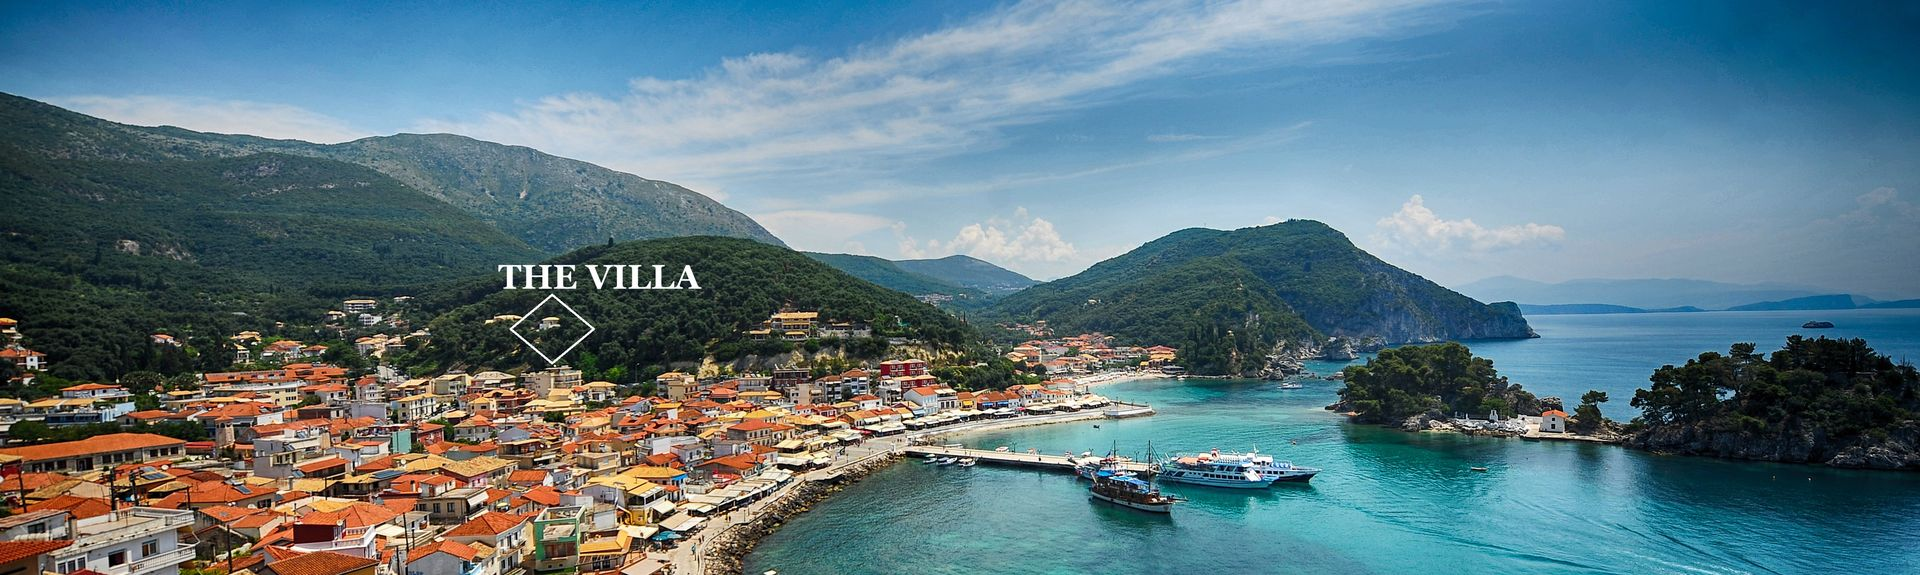 Margariti, Epirus - Western Macedonia, Grækenland